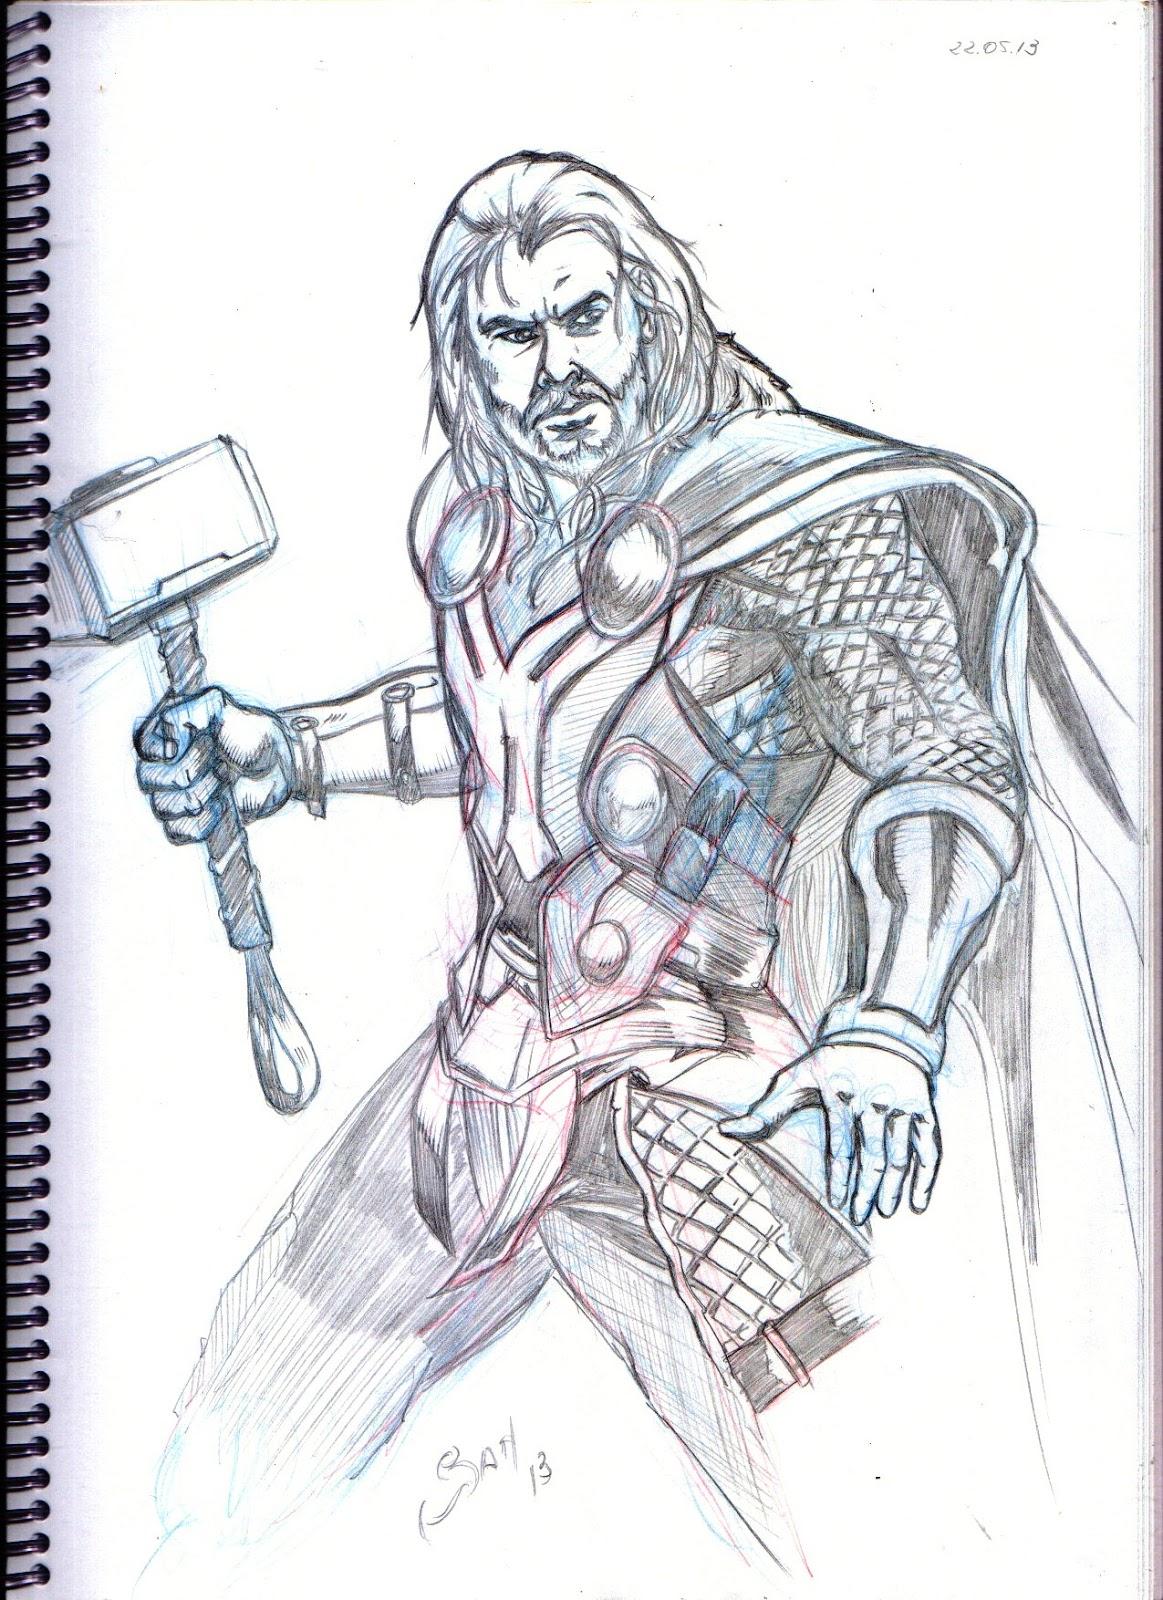 Thor+by+Sandro+Costa.JPG